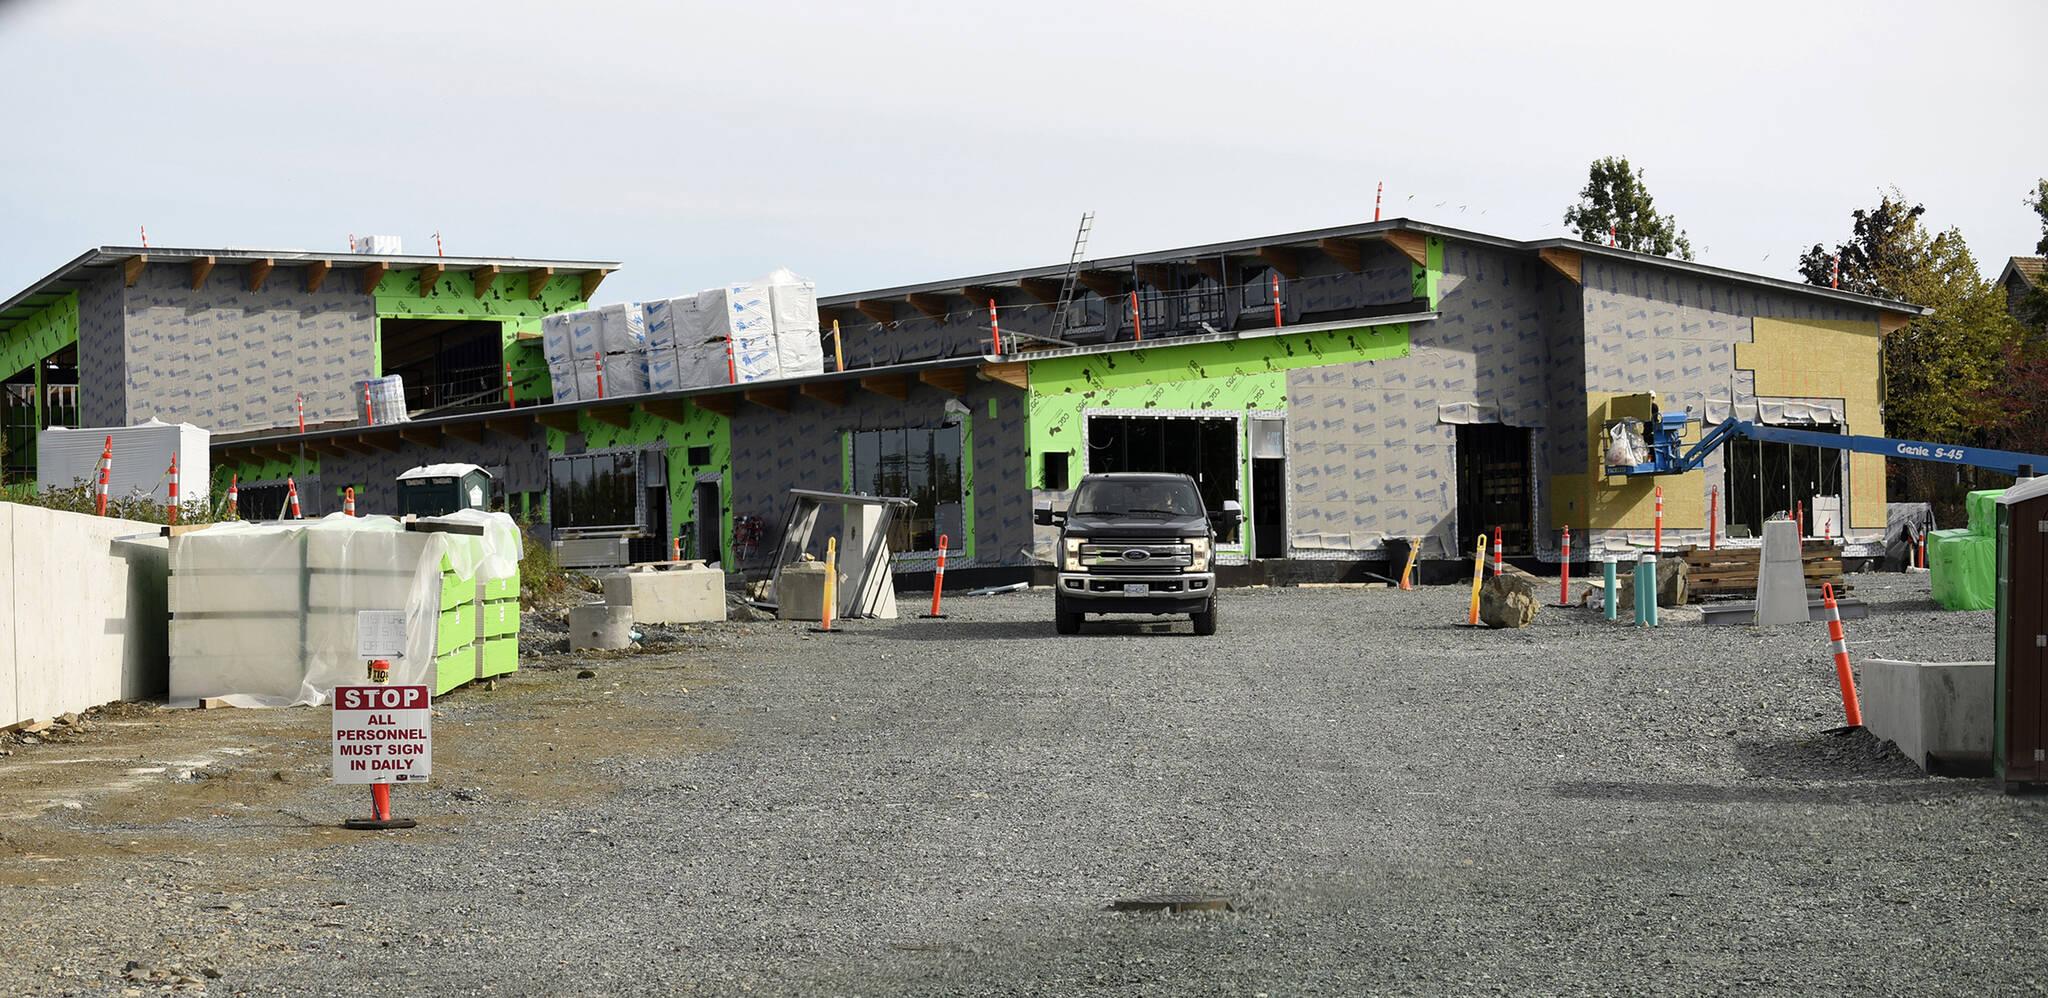 The new school will open in September 2022. (John Morrow/Abbotsford News)